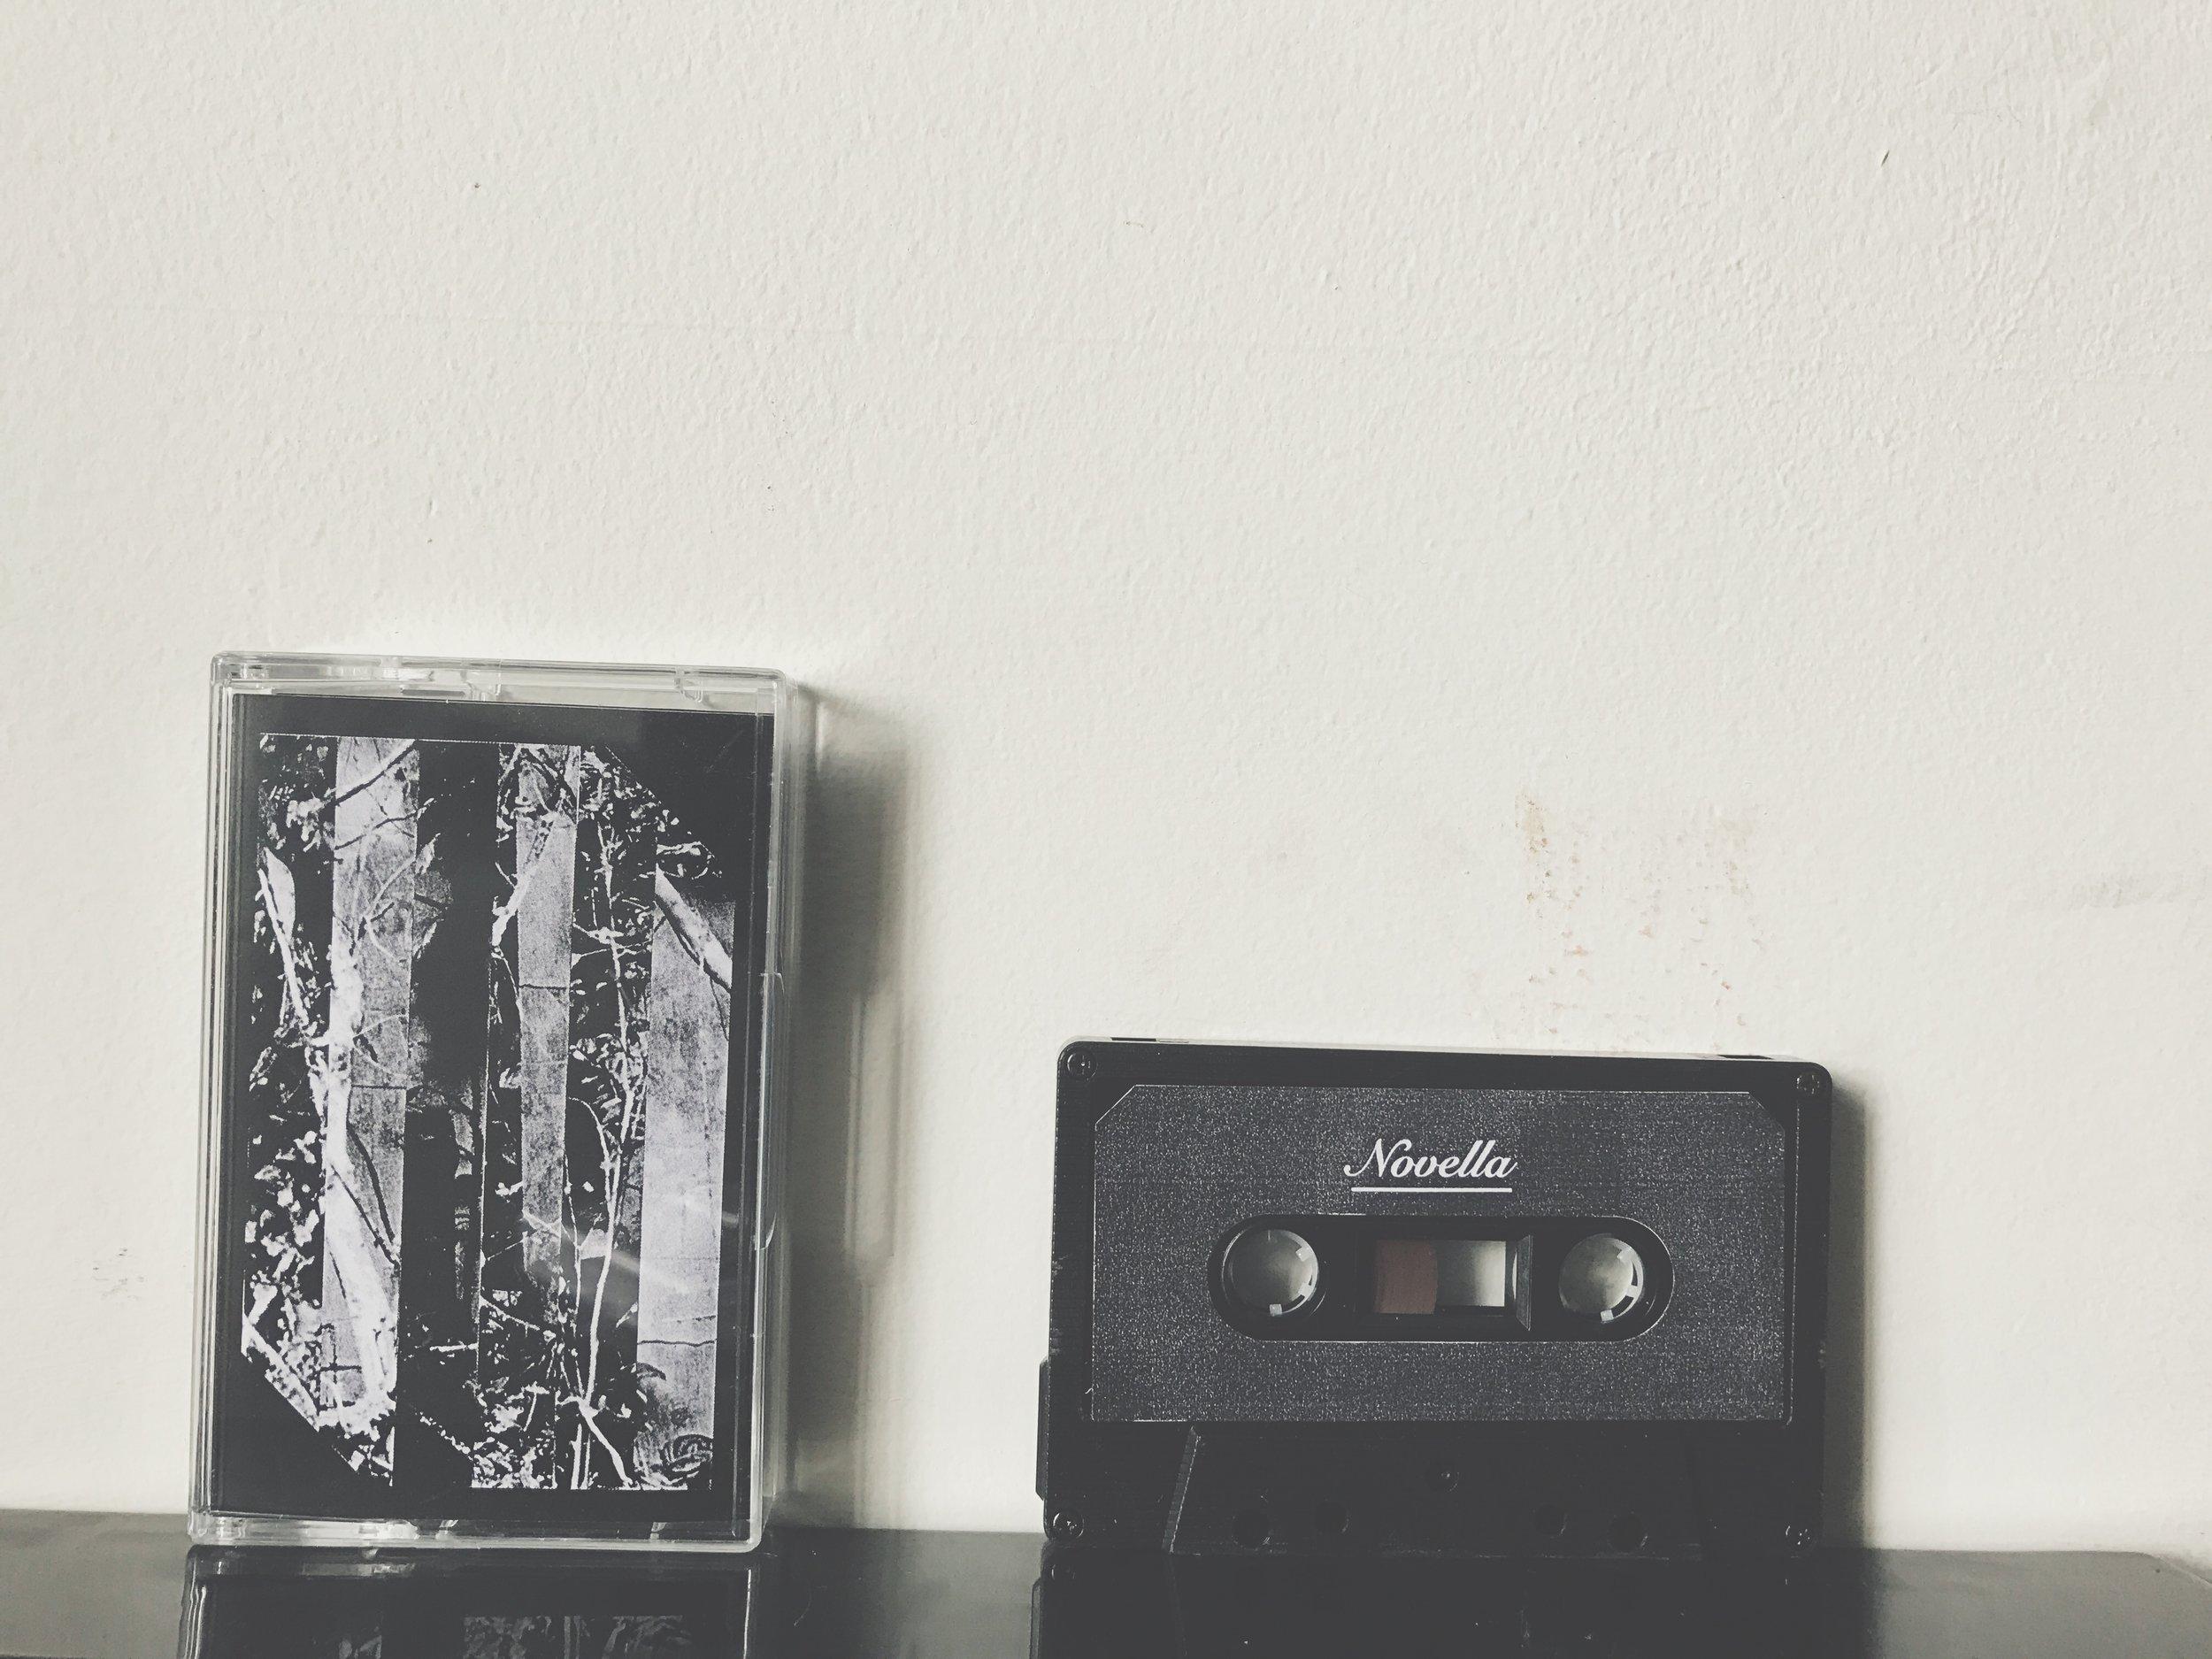 Leaaves - Novella (Audio. Visuals. Atmosphere.)